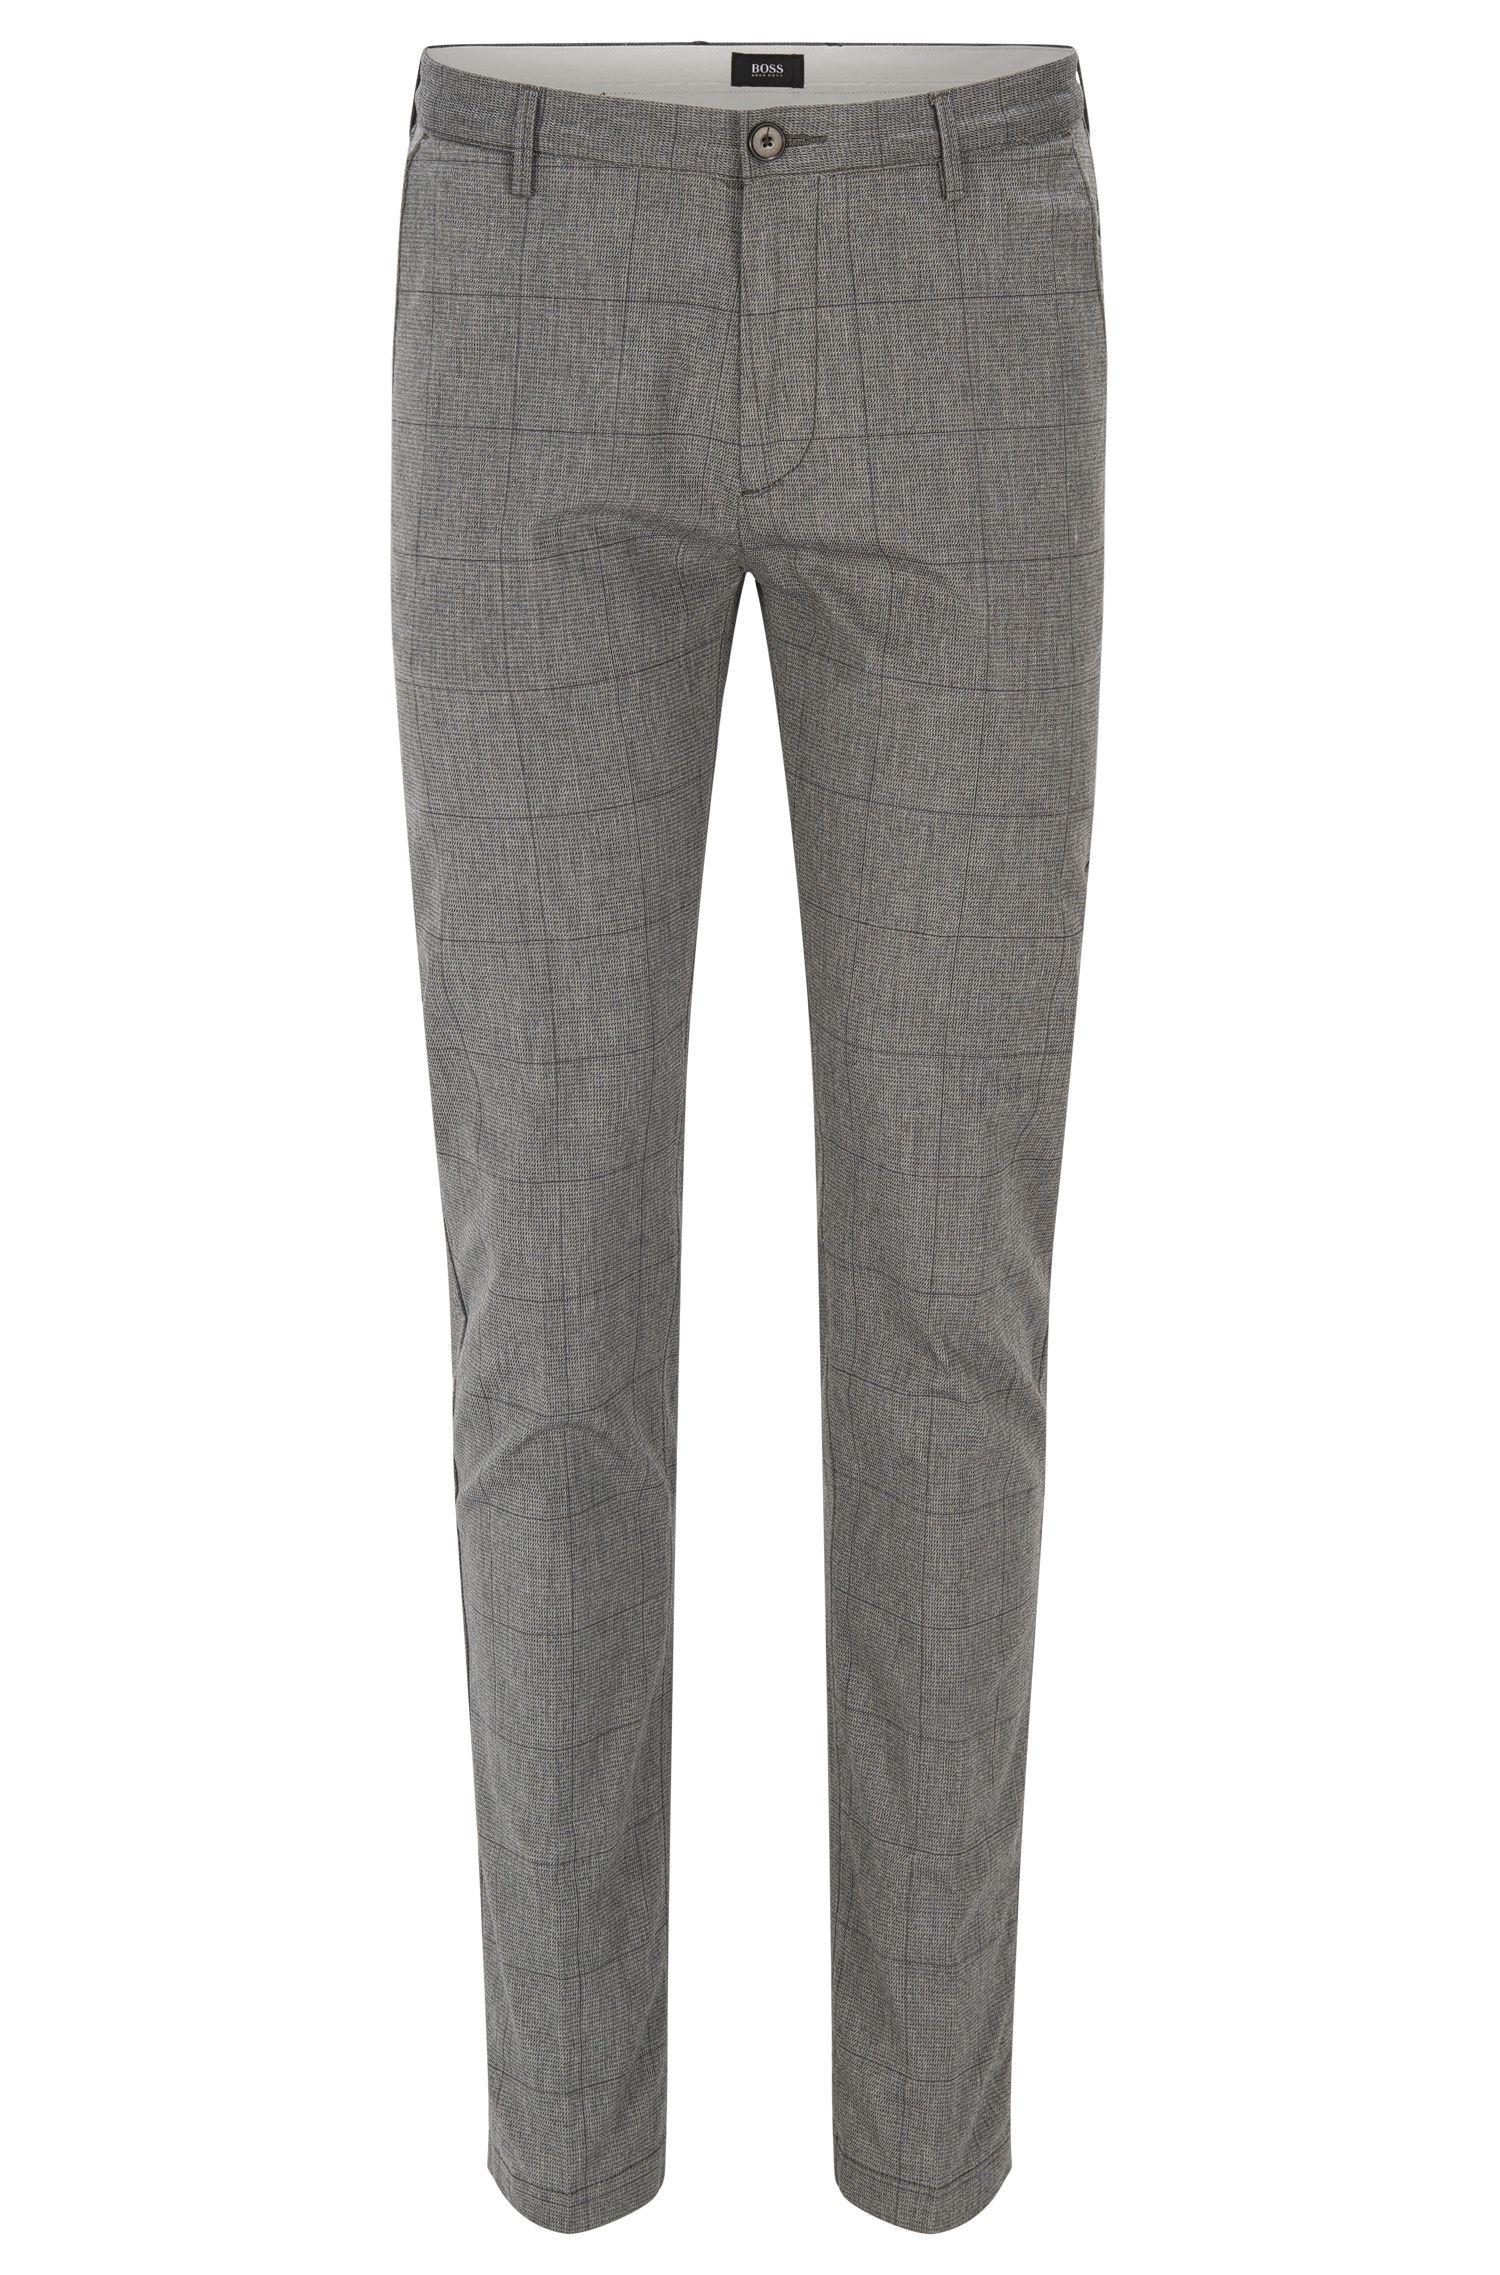 Windowpane Stretch Cotton Pant, Slim Fit | Rice W